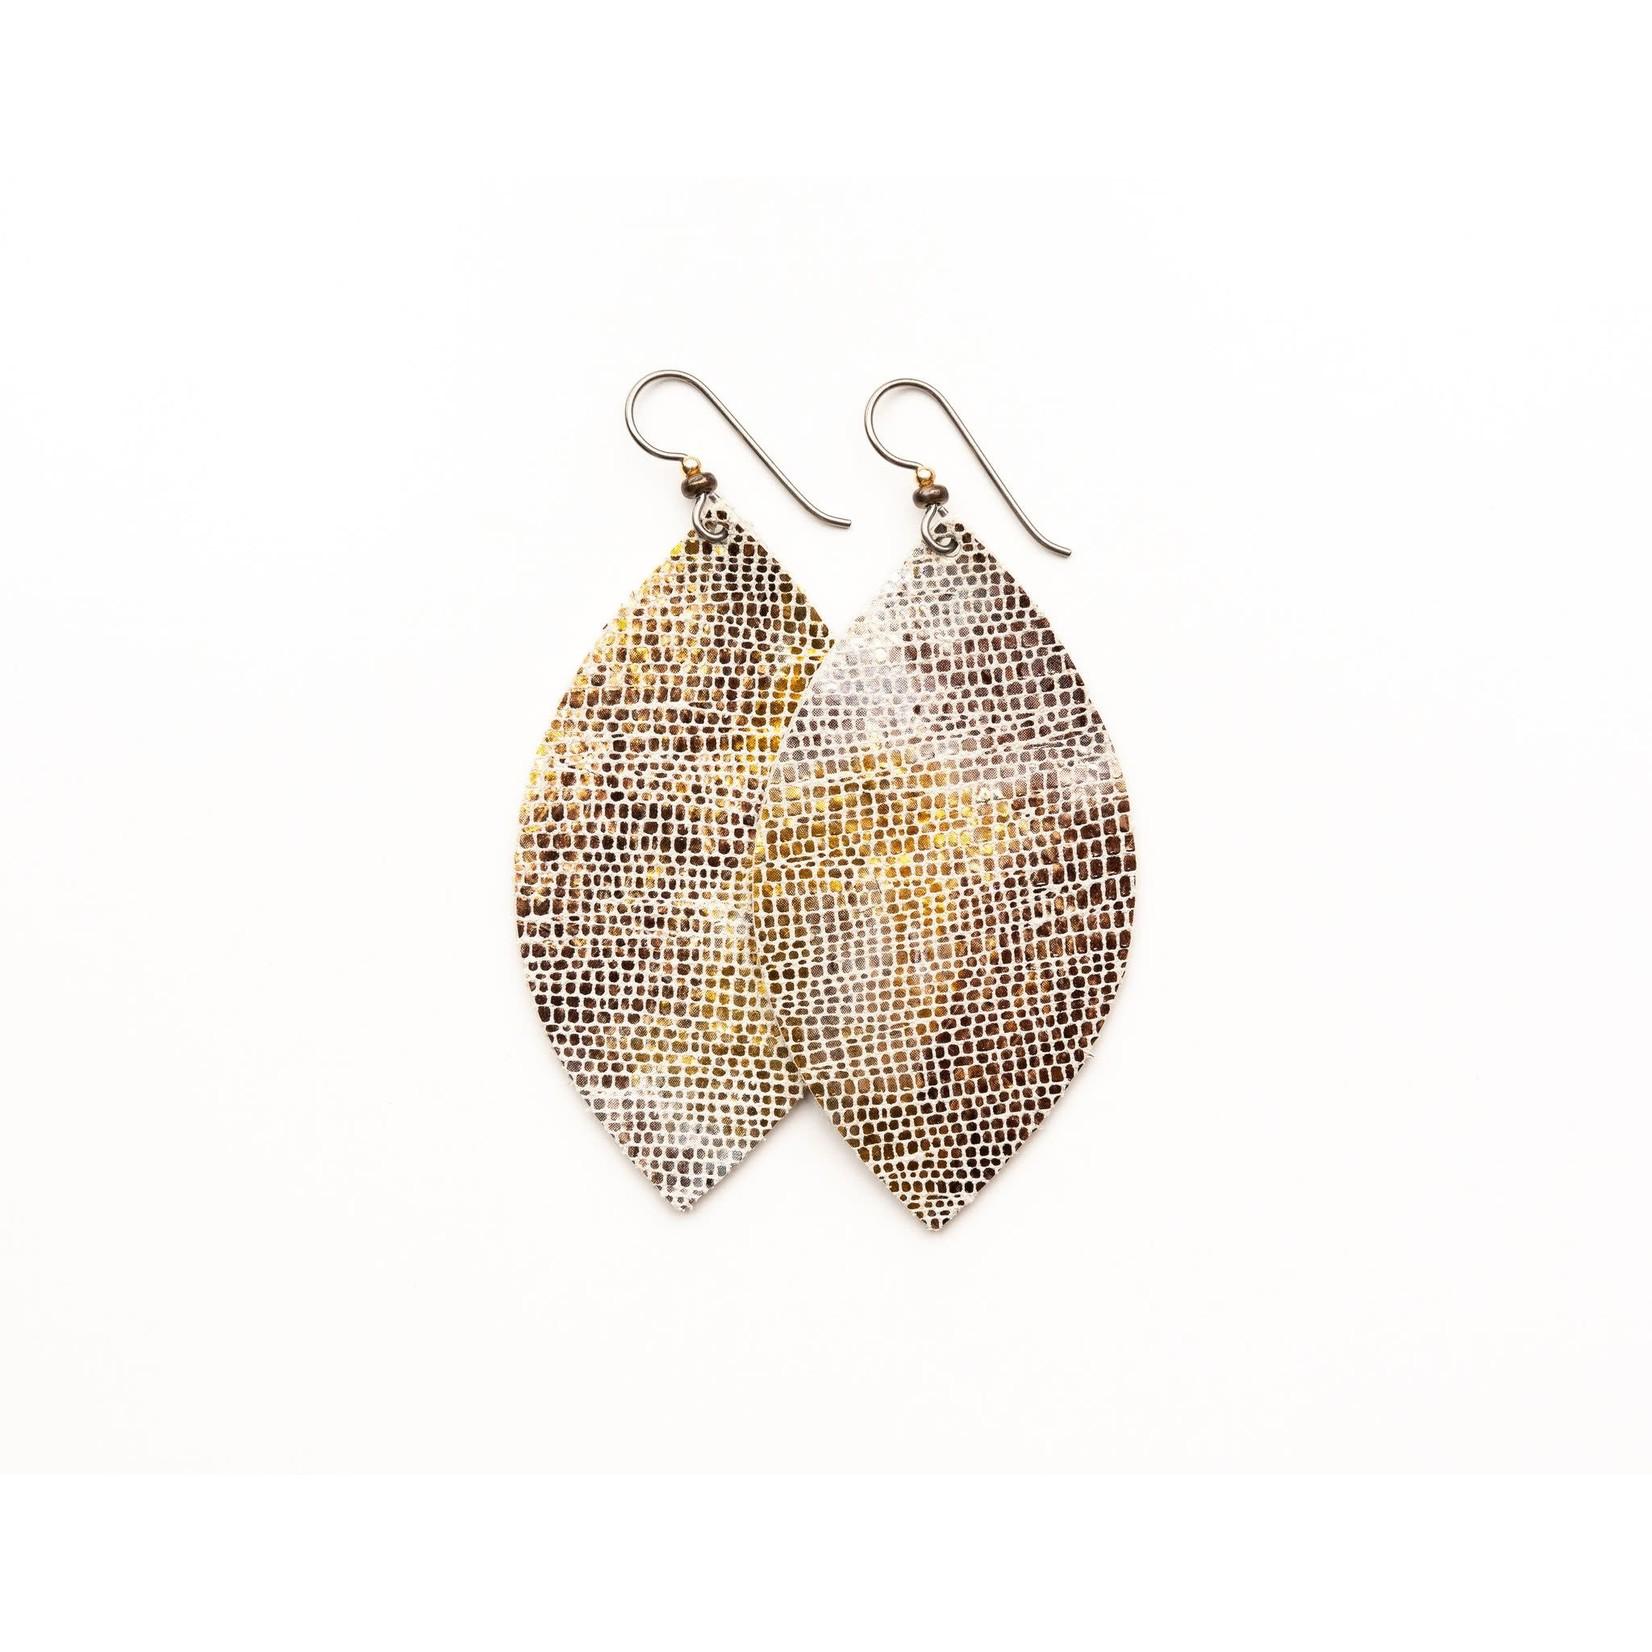 Keva Style Large Leather Gold & Bronze Shimmer Earrings